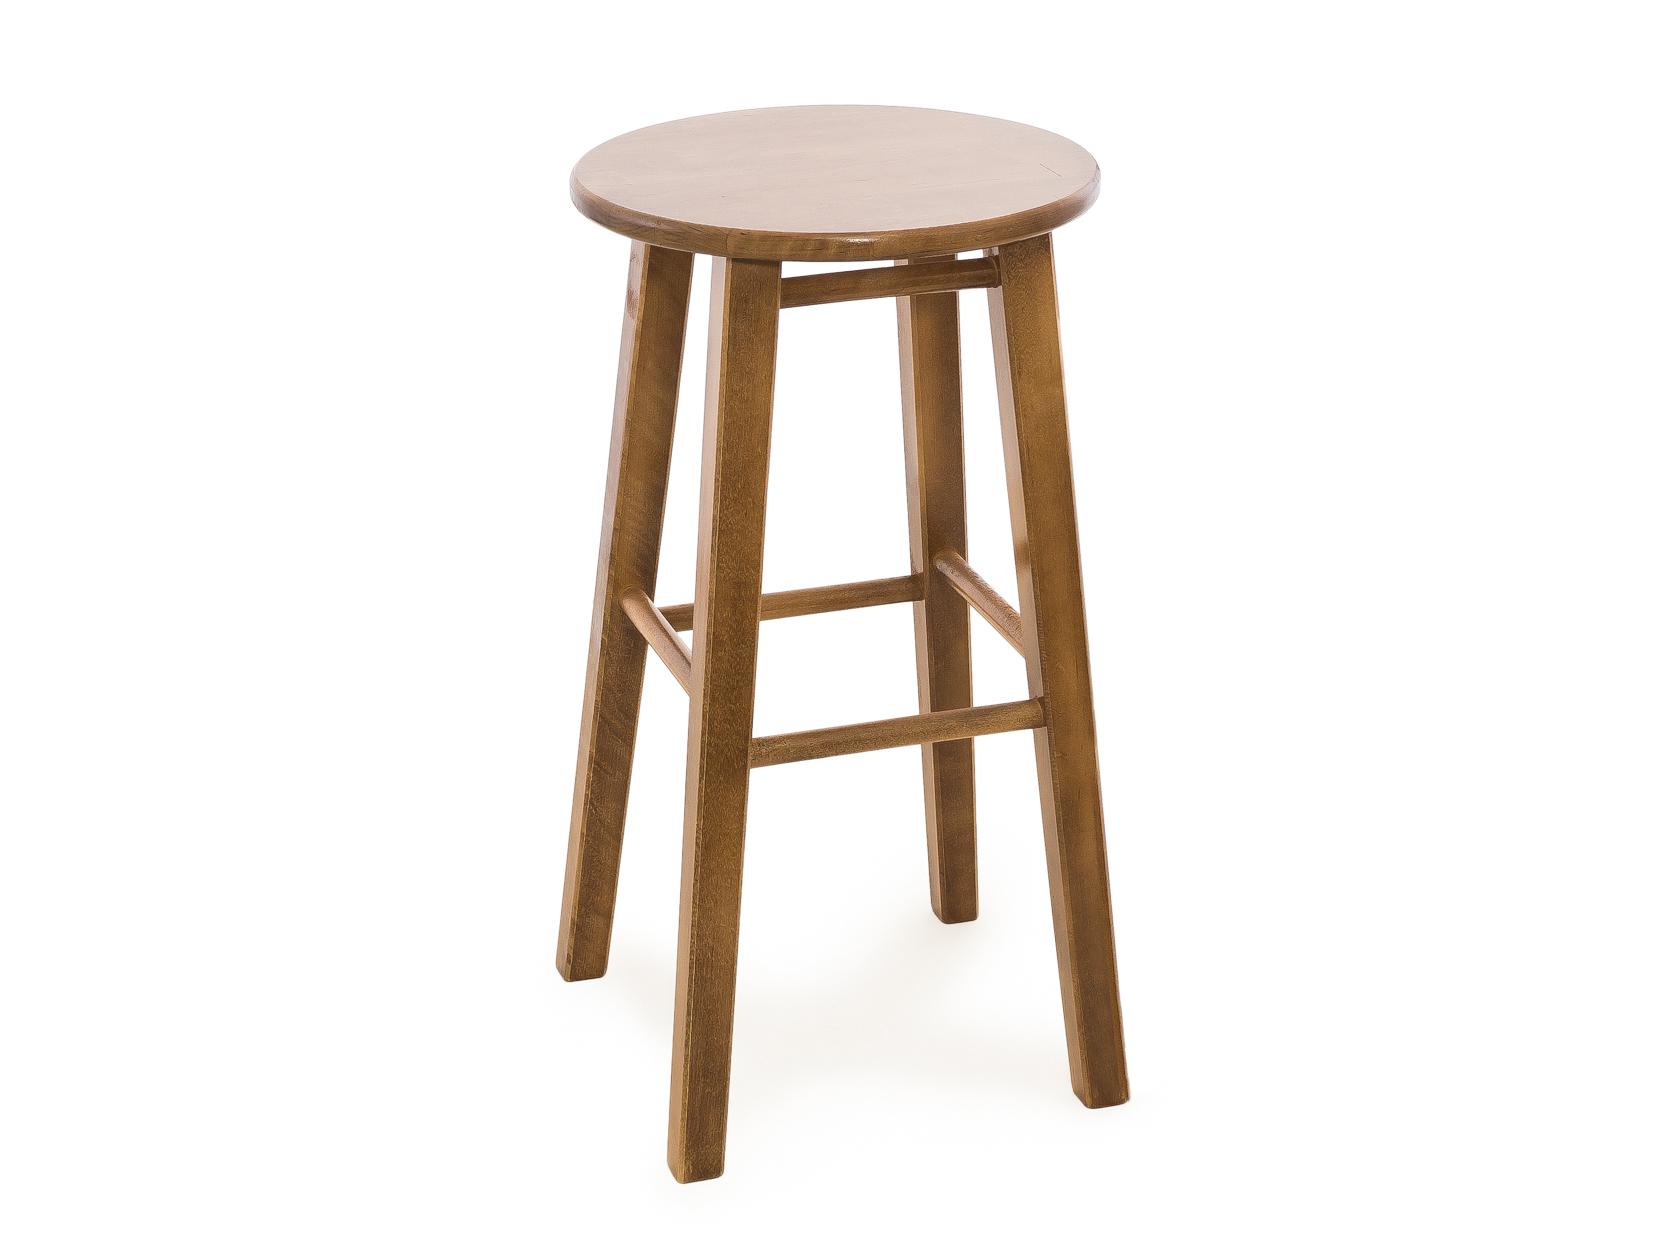 Барный стул СМКА КМ023Б, светлый орех